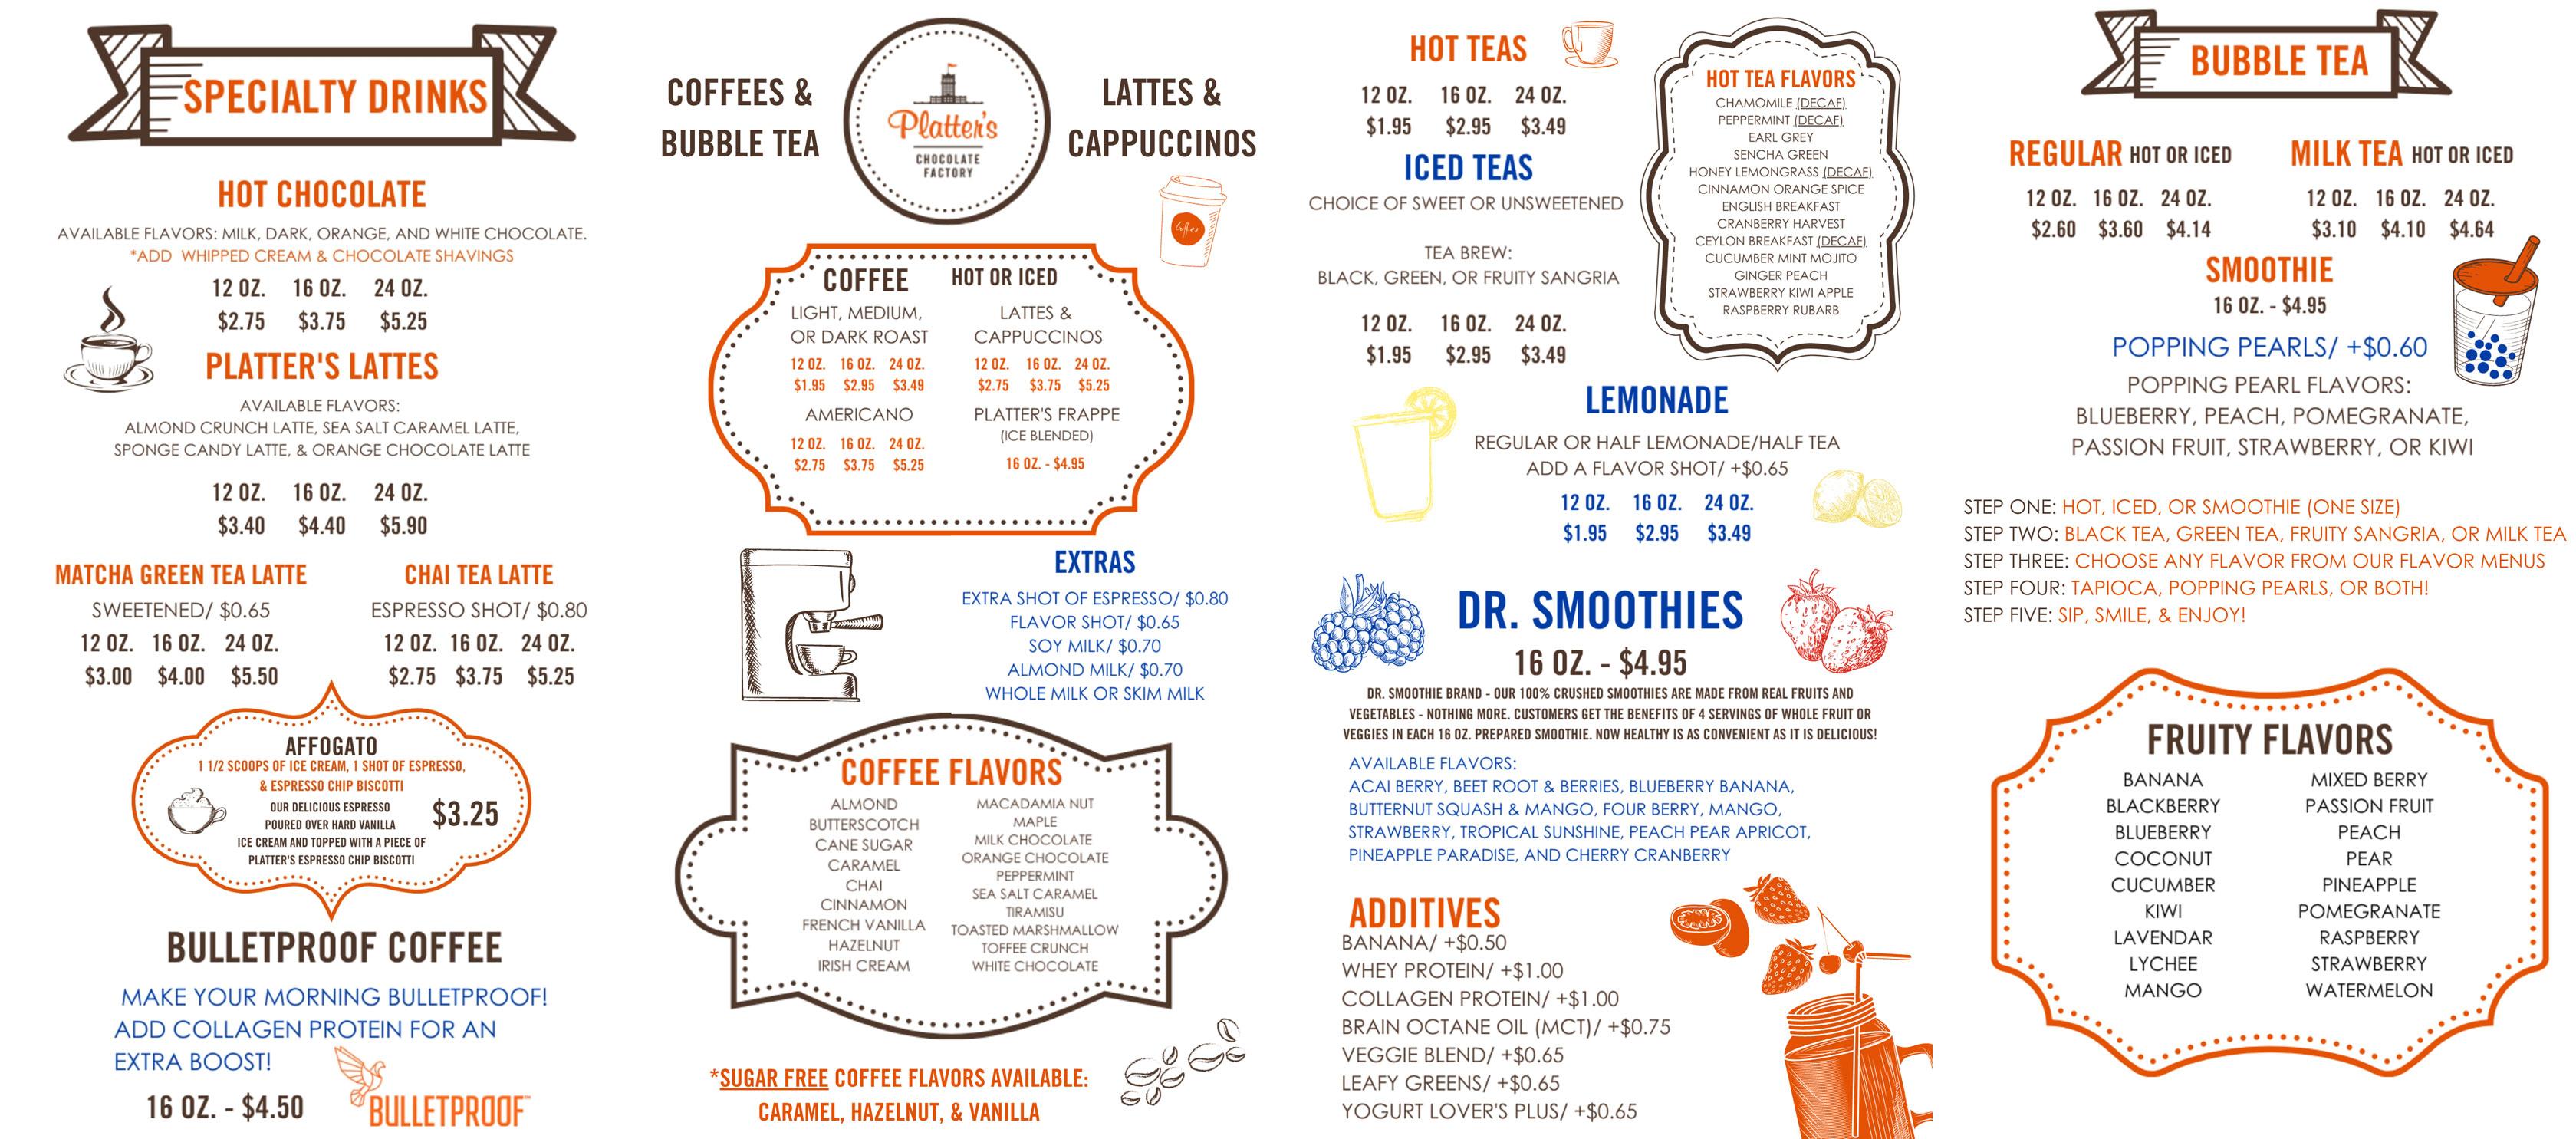 platter-s-cafe-menu-07232021.jpg